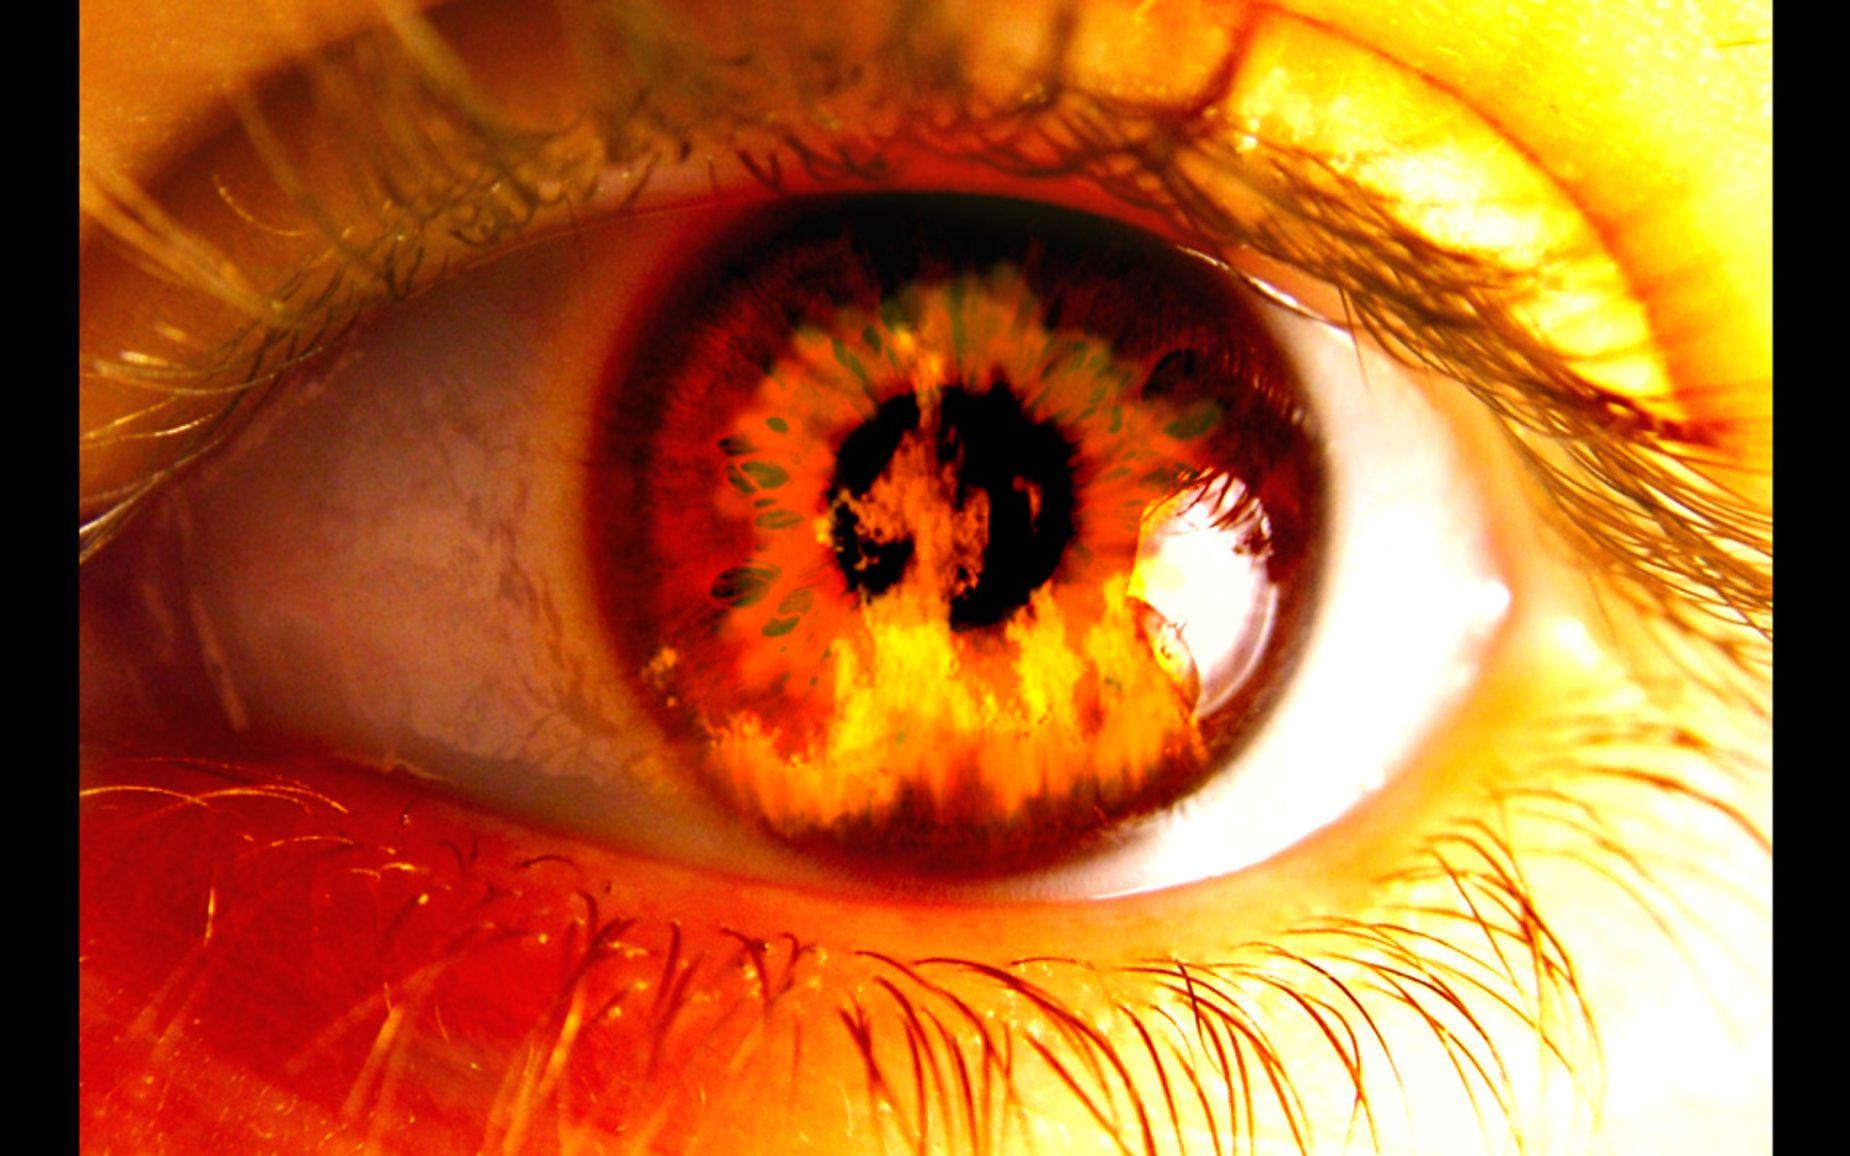 Kishan's burning eyes | Tiger's Voyage | Fire eyes, Photos